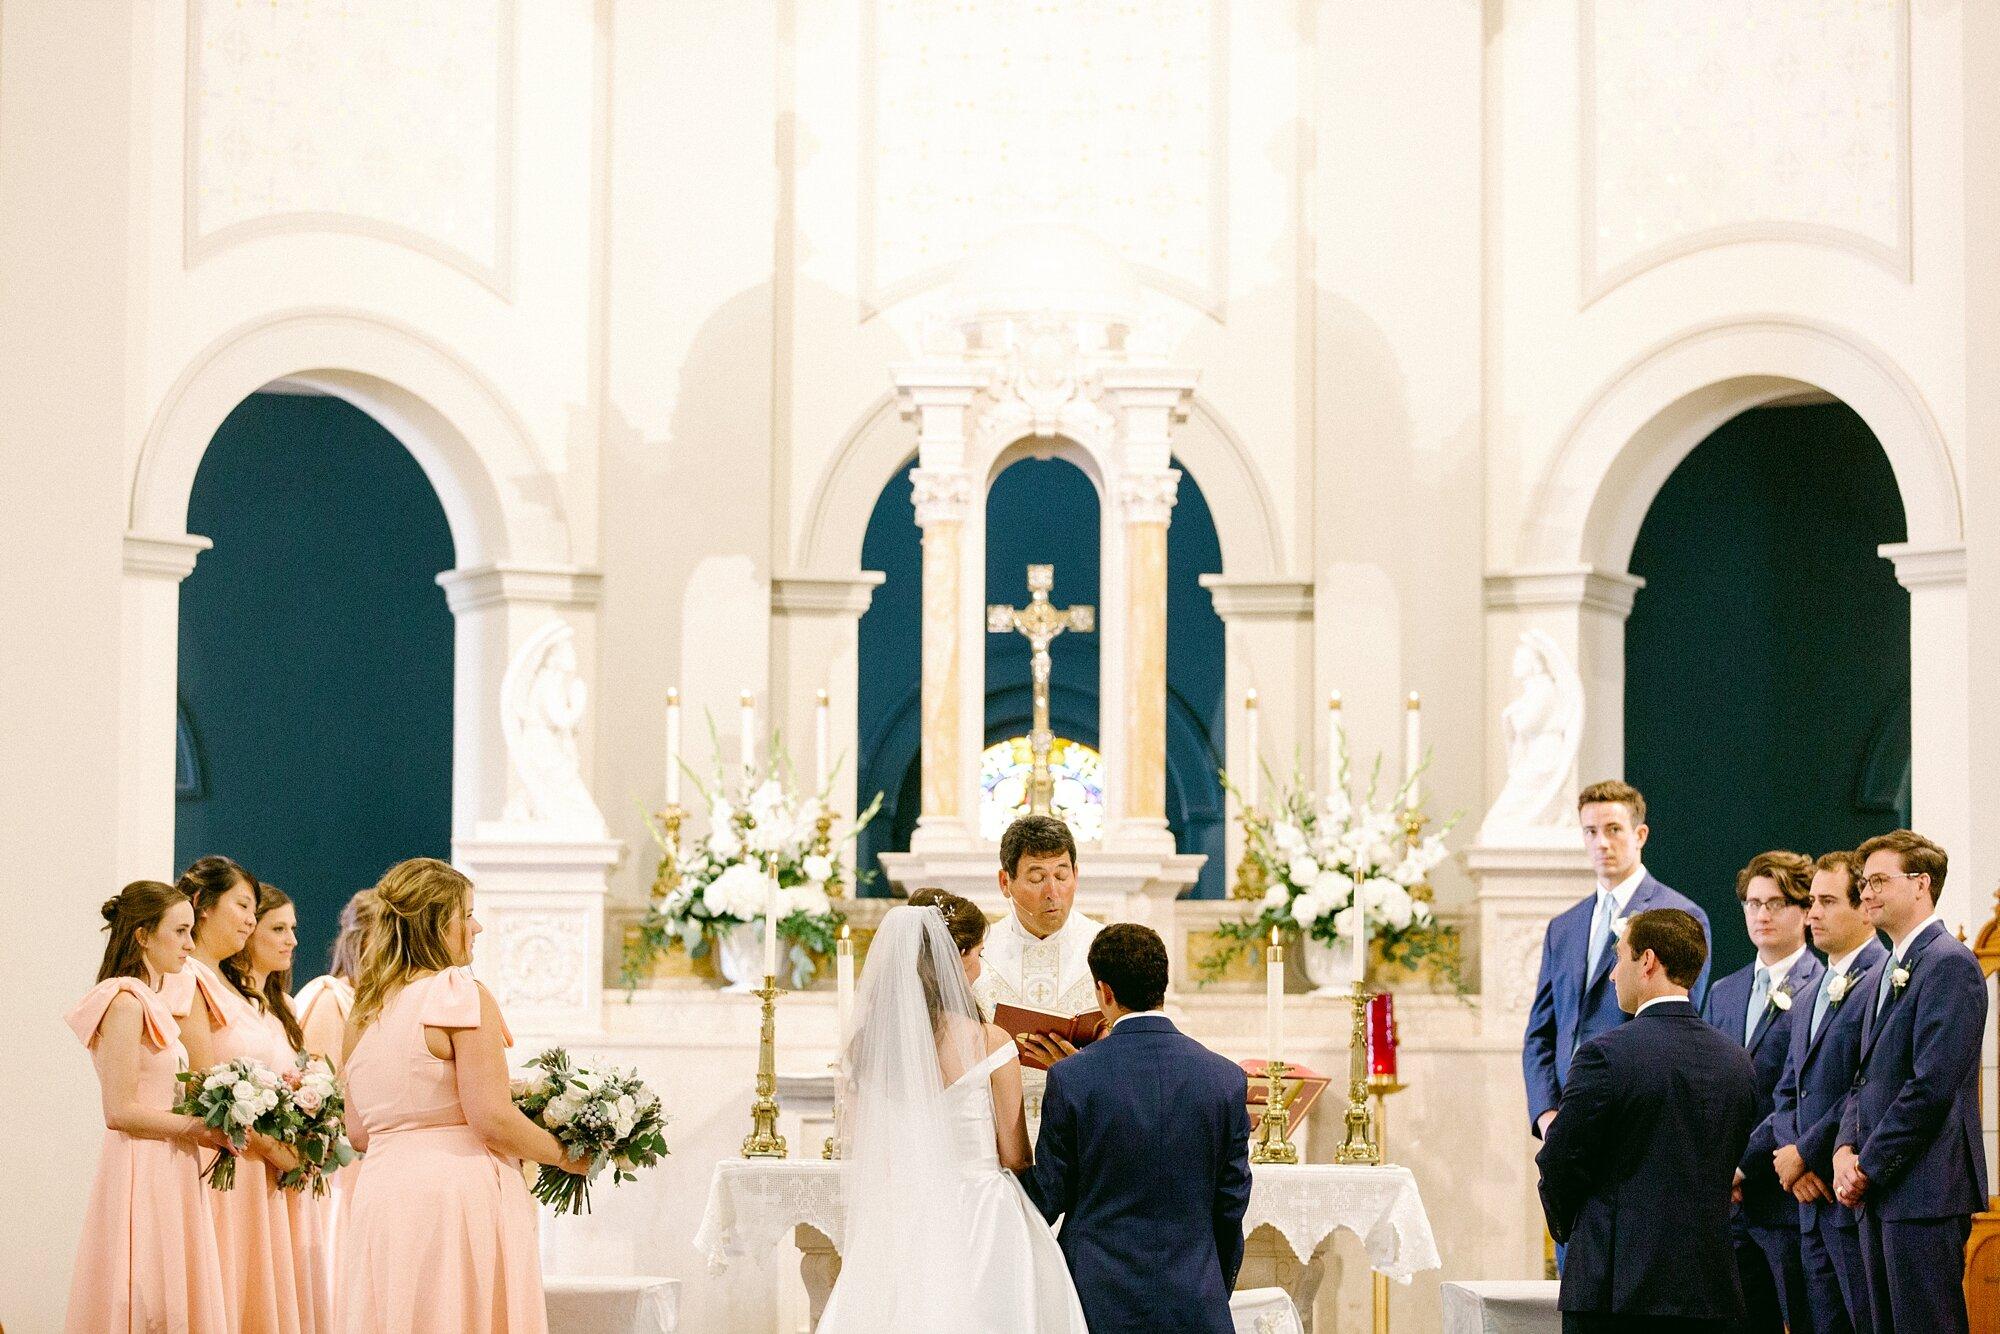 Bay_St_Louis_Wedding_Photographer_0530.jpg